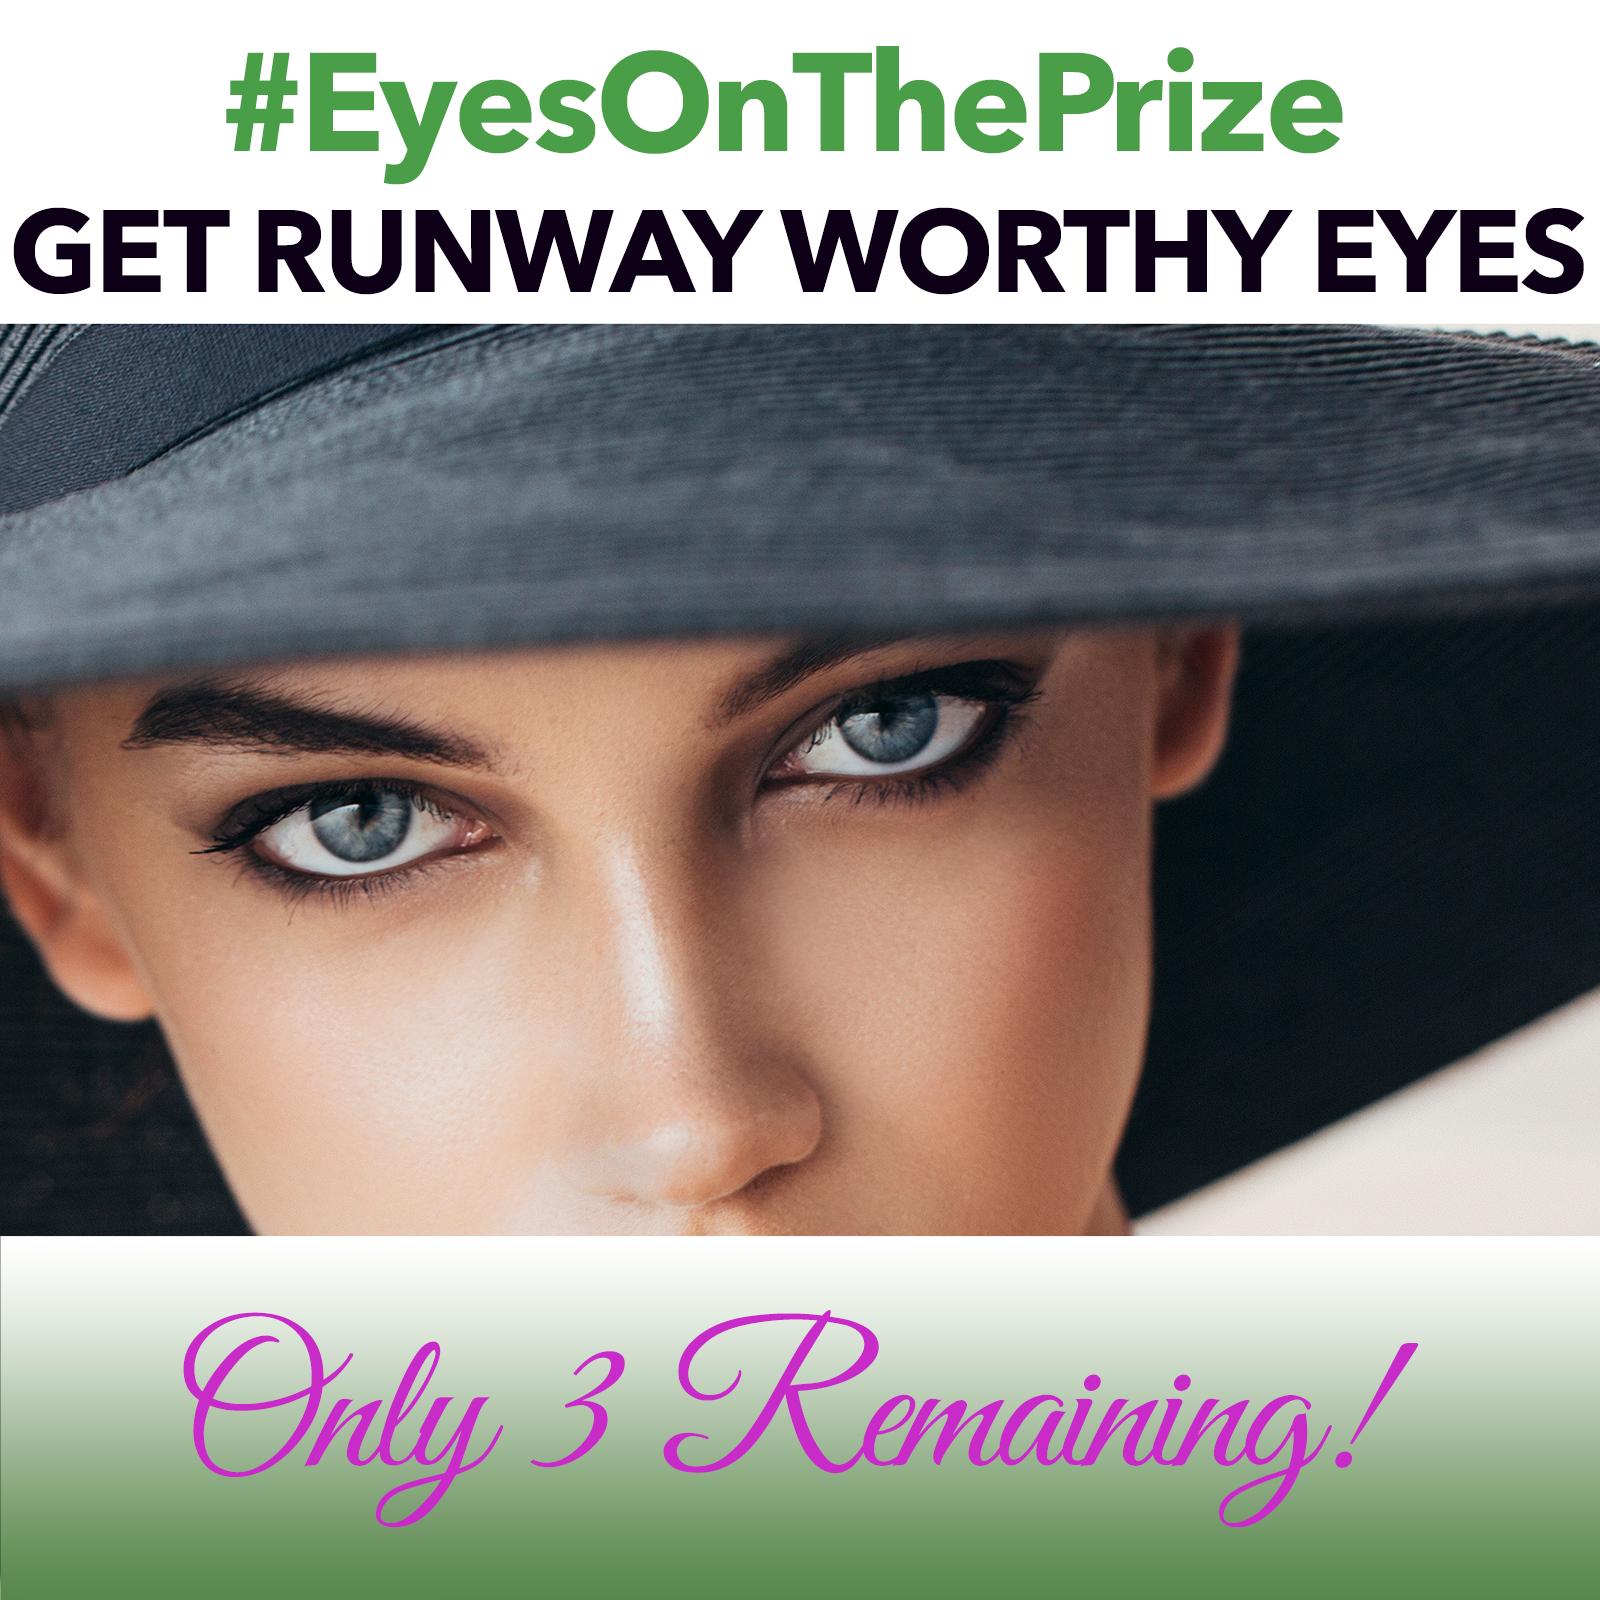 PHOTO: SKY's #EyesonthePrize Instagram Challenge in honor of Del Mar Derby Day to benefit Nine Months Matter.